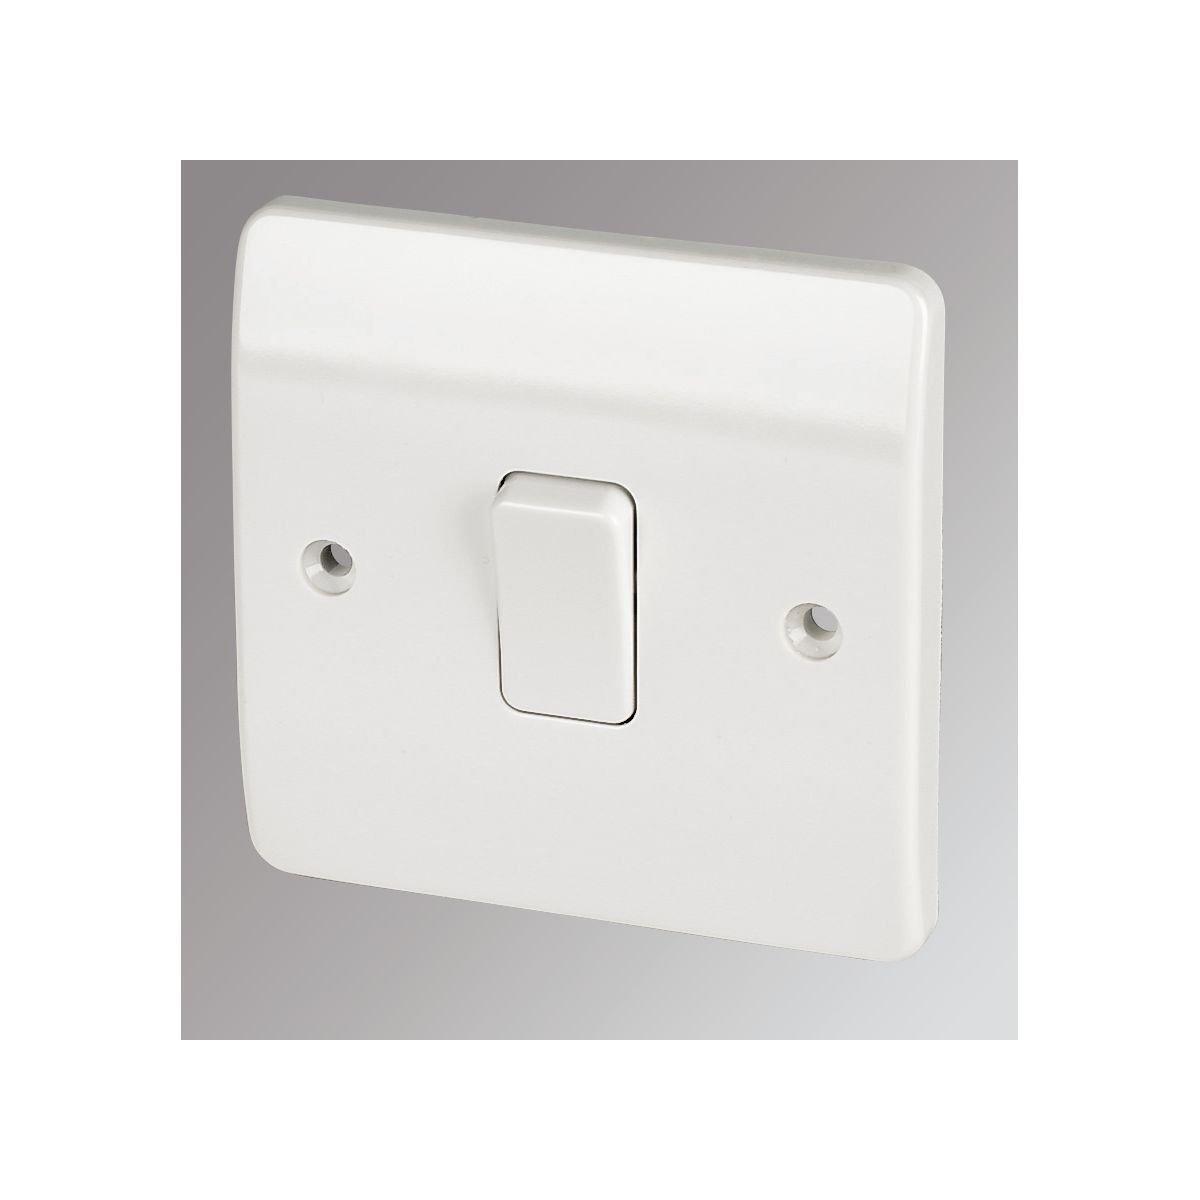 MK 1-Gang 2-Way 10AX Light Switch White: Amazon.co.uk: DIY & Tools